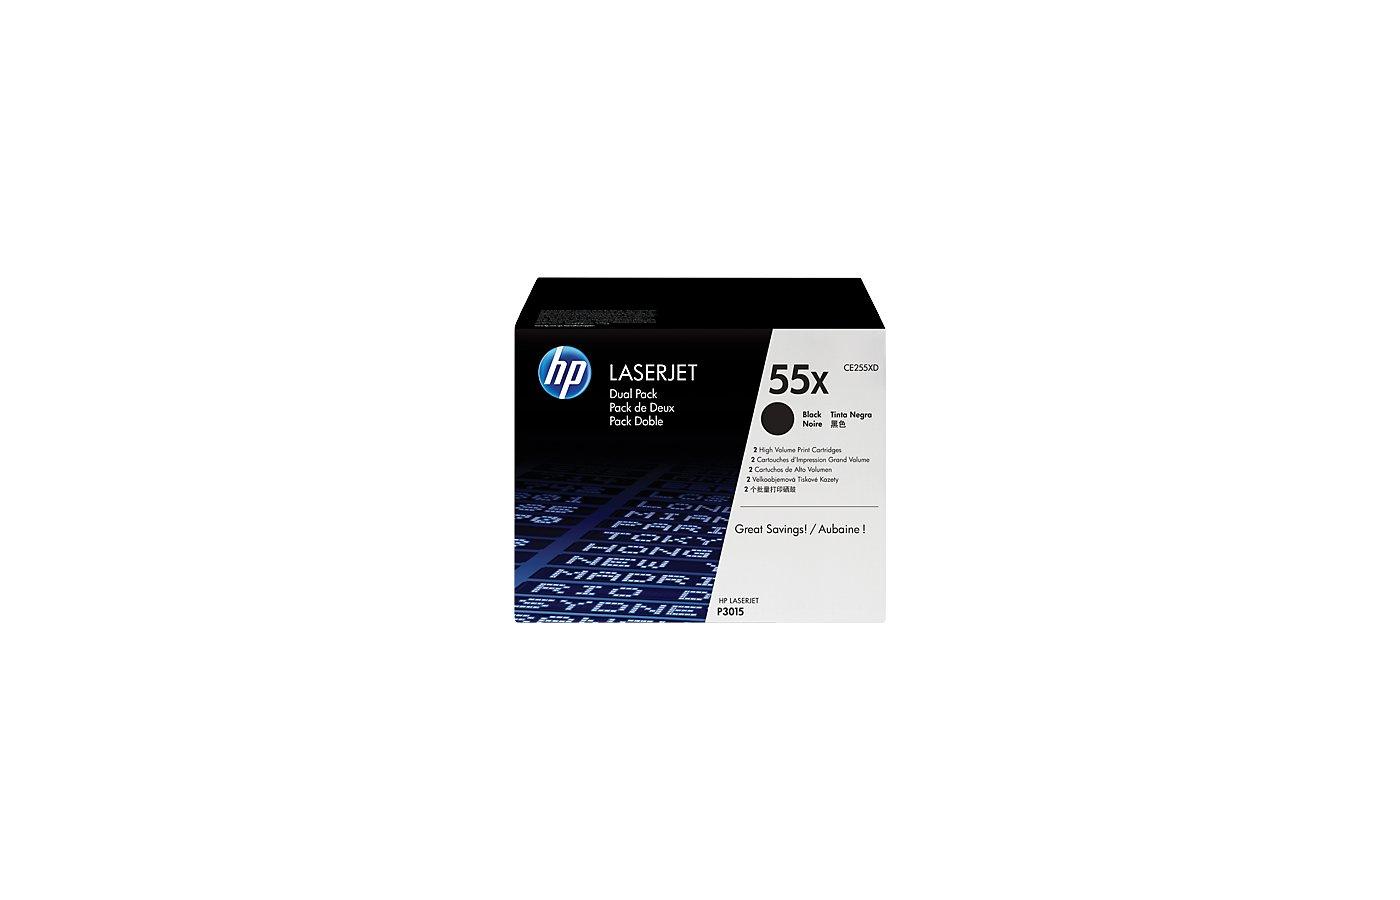 Картридж лазерный HP 55X CE255XD черный x2уп. для HP LJ P3015d/P3015dn/P3015n/P3015x (25000стр.)